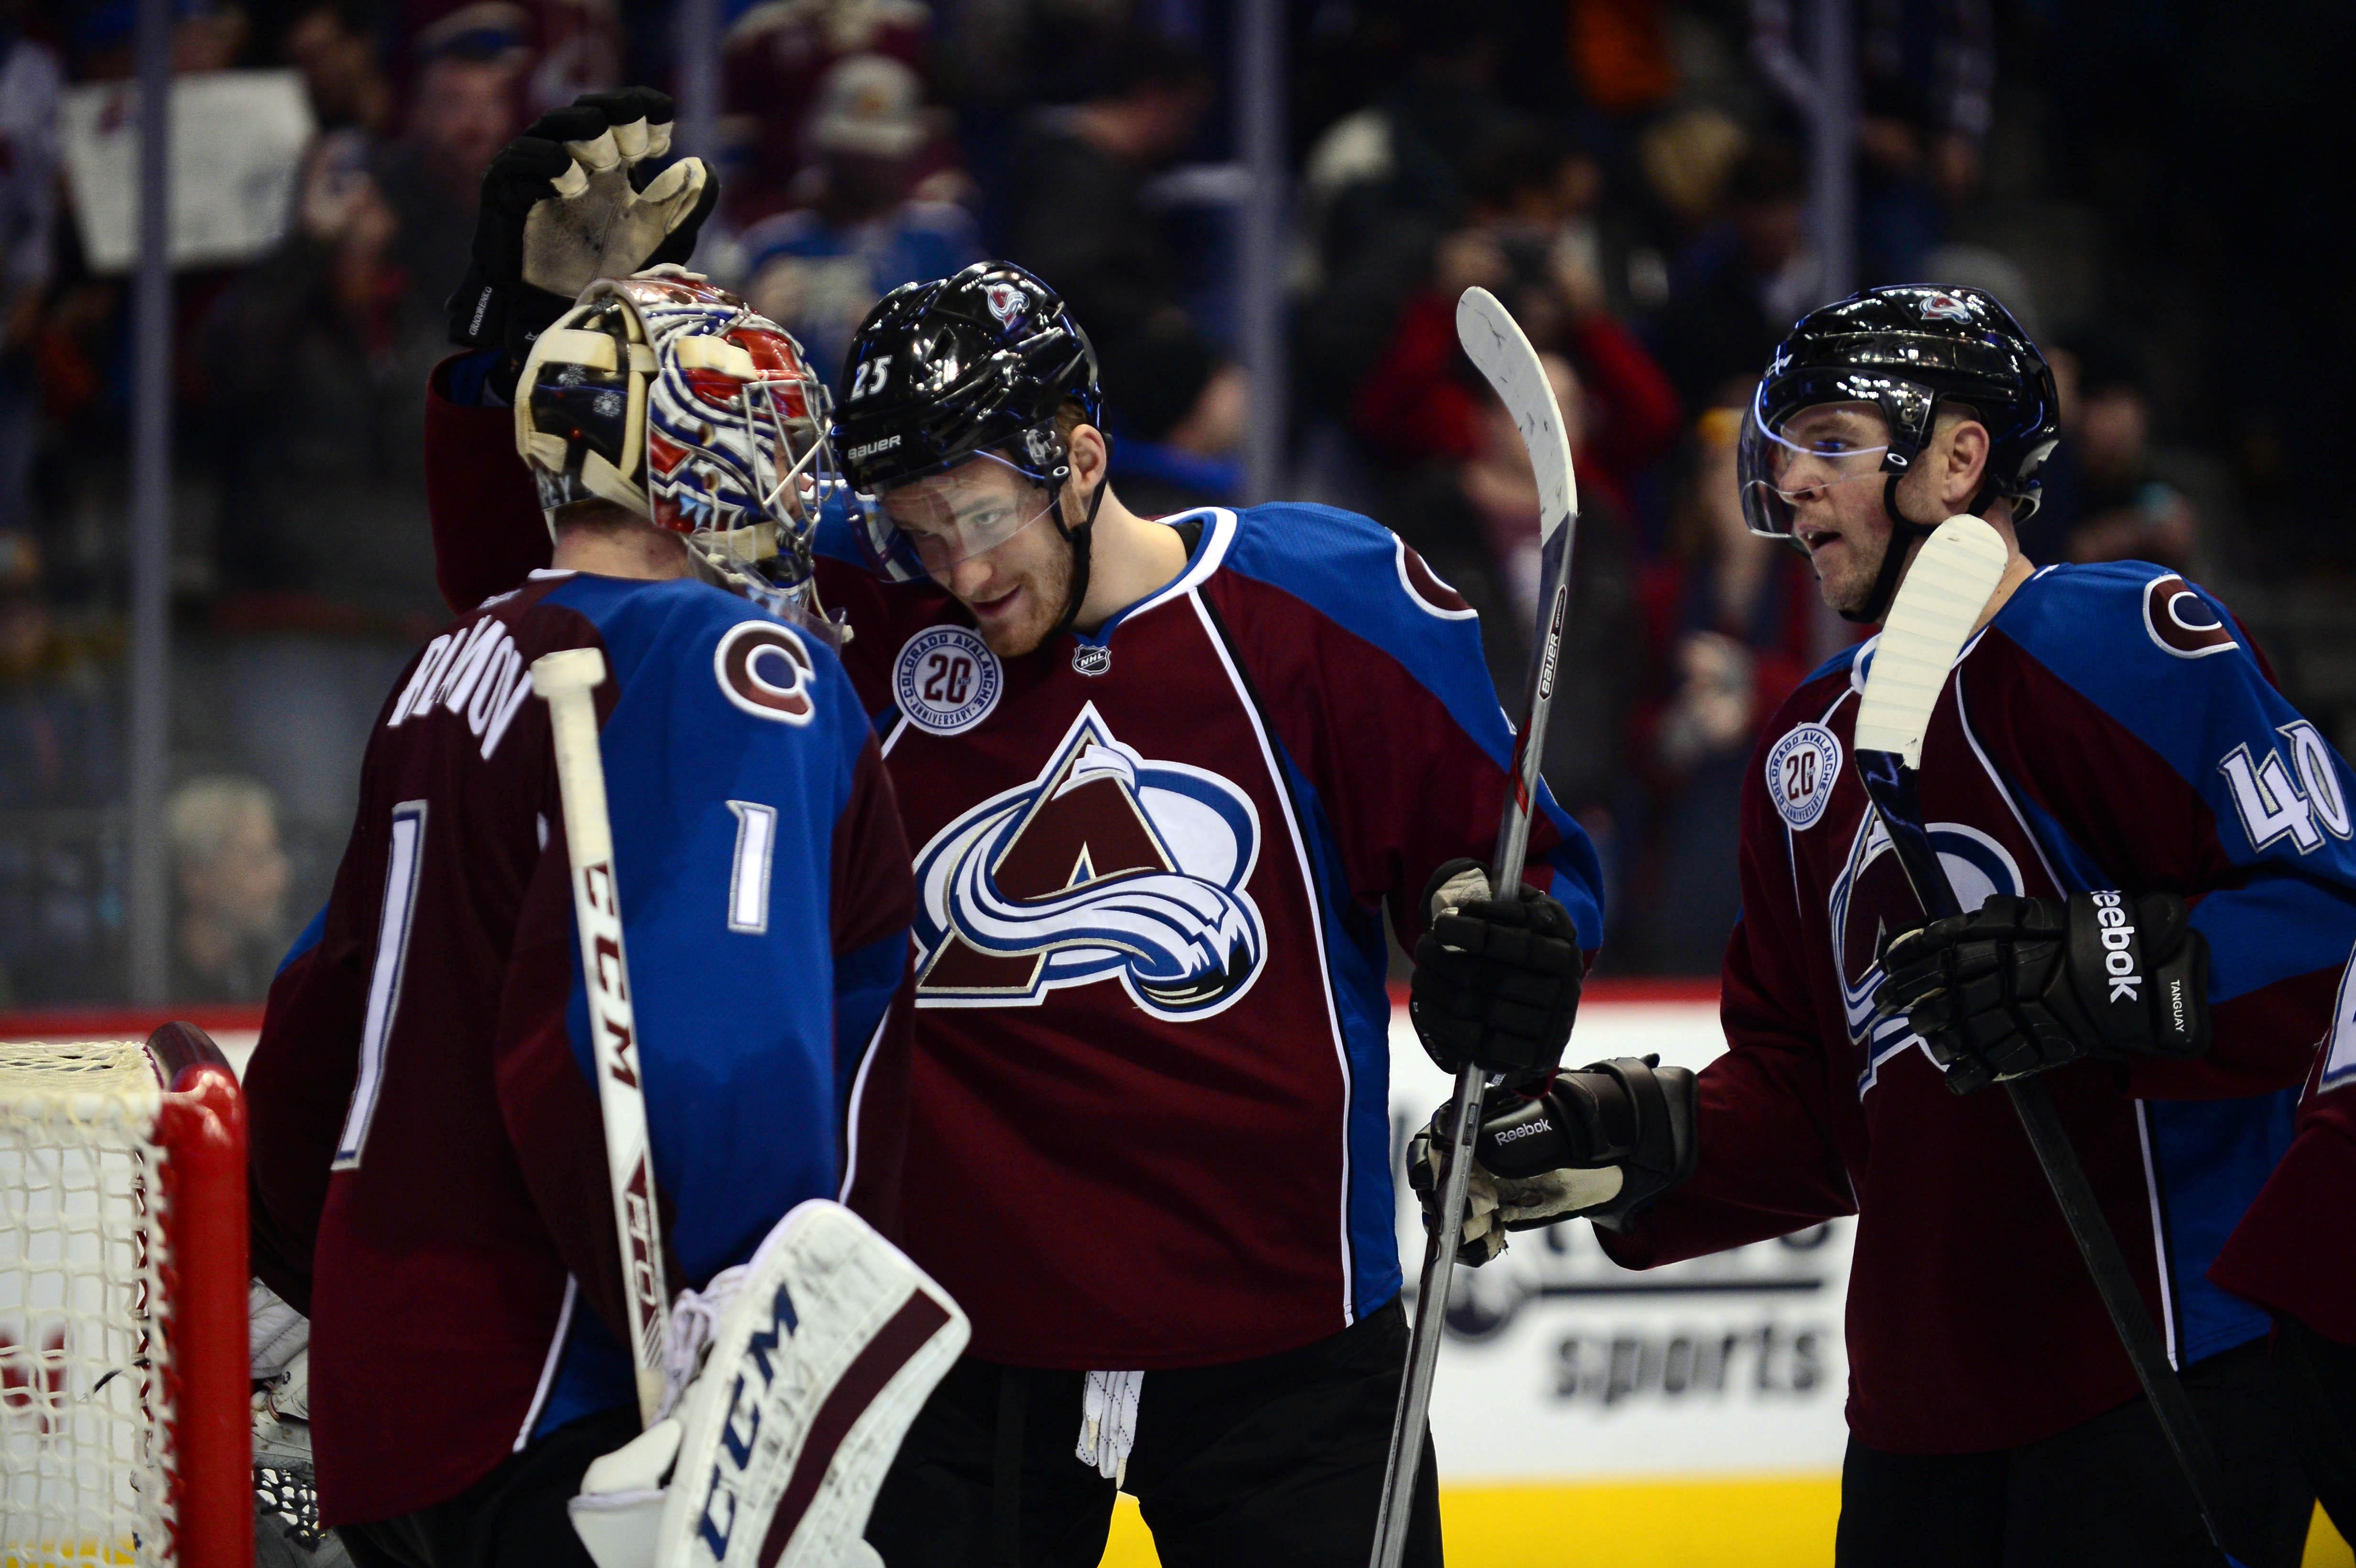 NHL: New York Islanders at Colorado Avalanche